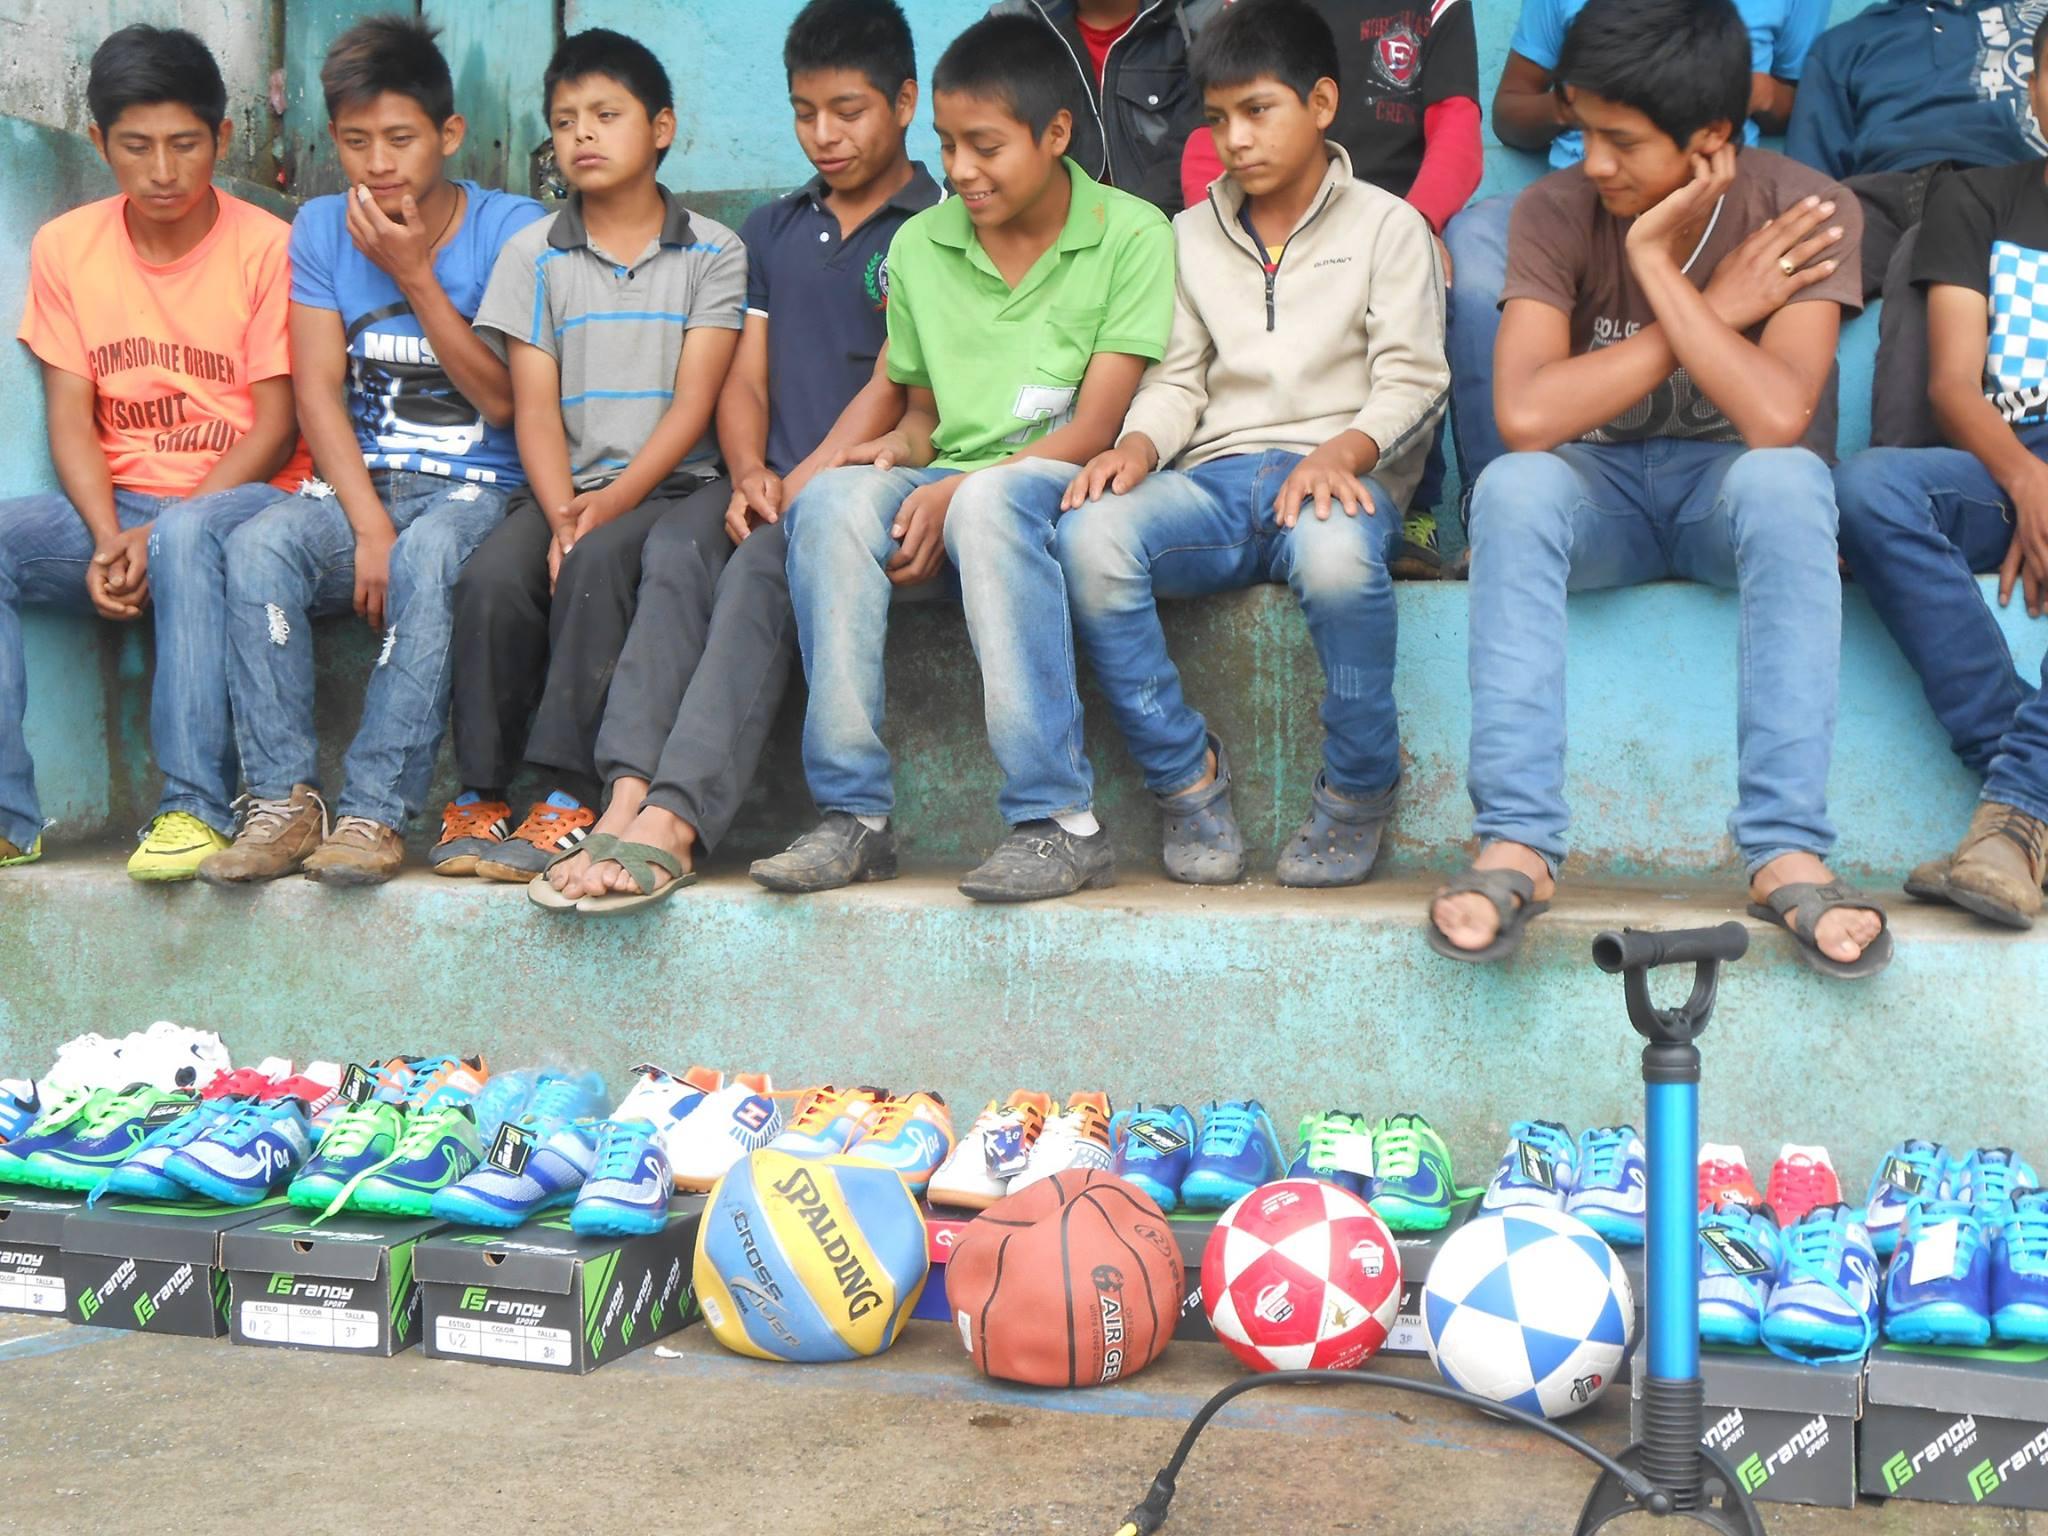 New soccer balls